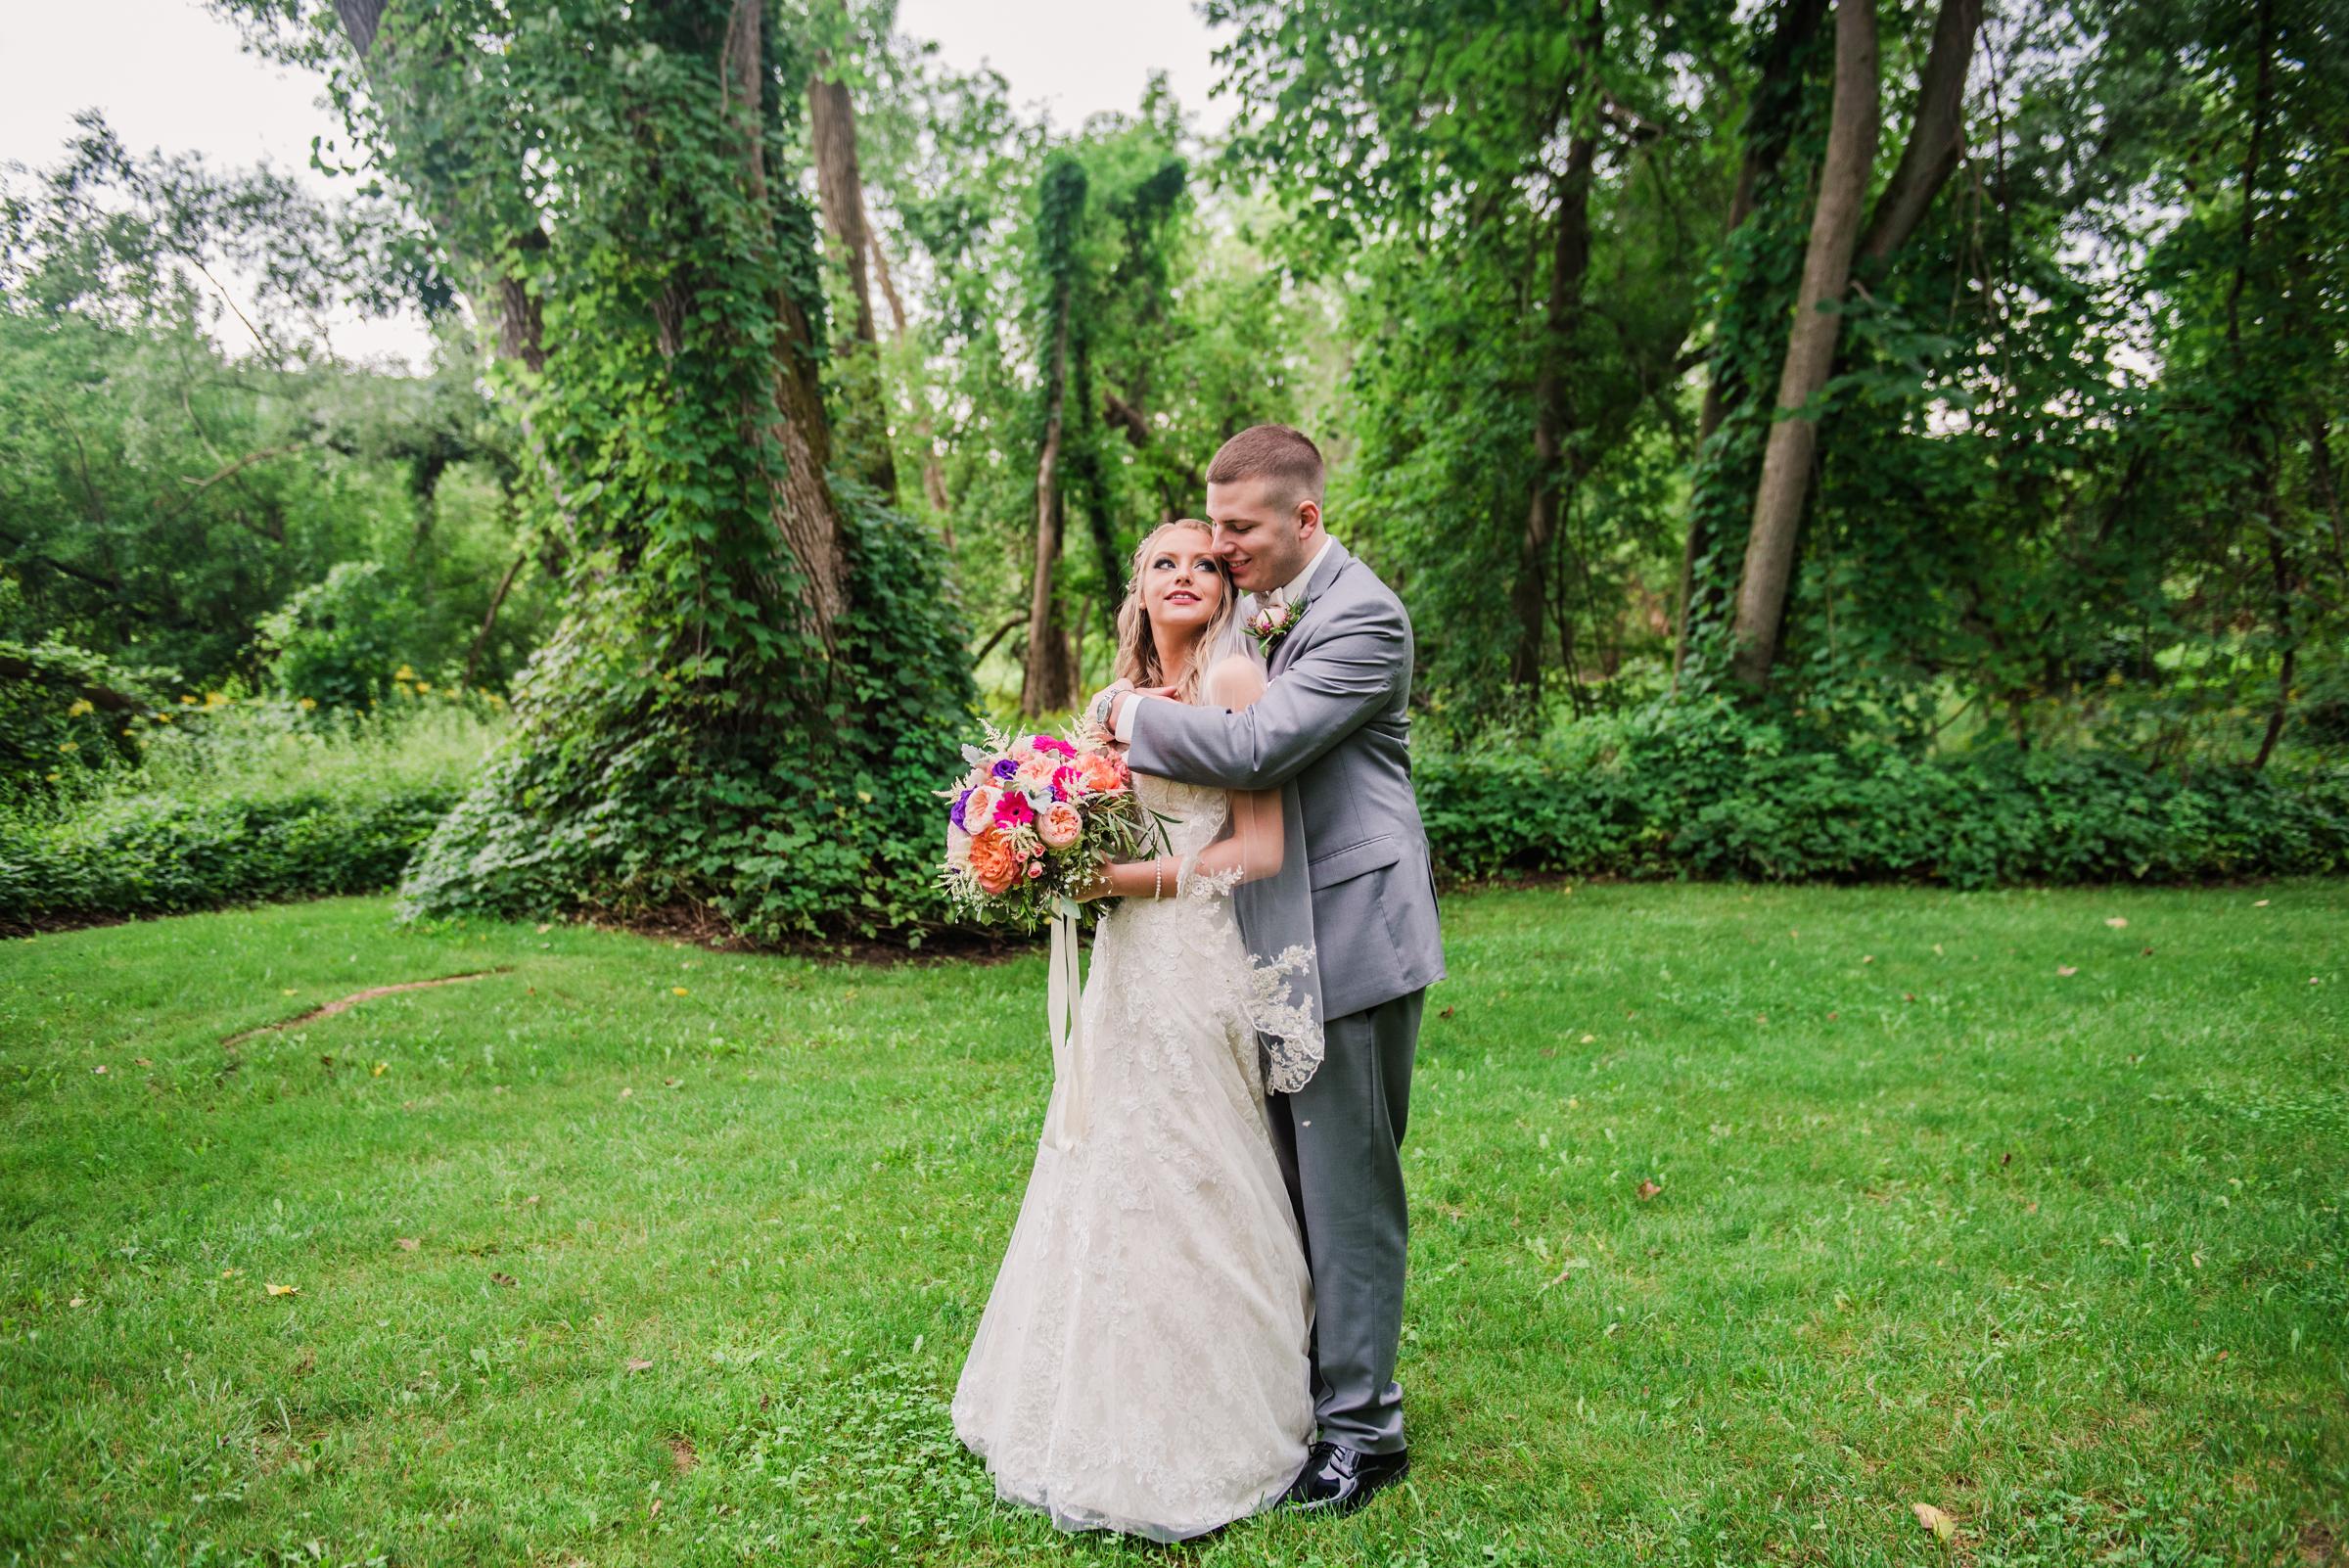 Wolf_Oak_Acres_Central_NY_Wedding_JILL_STUDIO_Rochester_NY_Photographer_DSC_8737.jpg